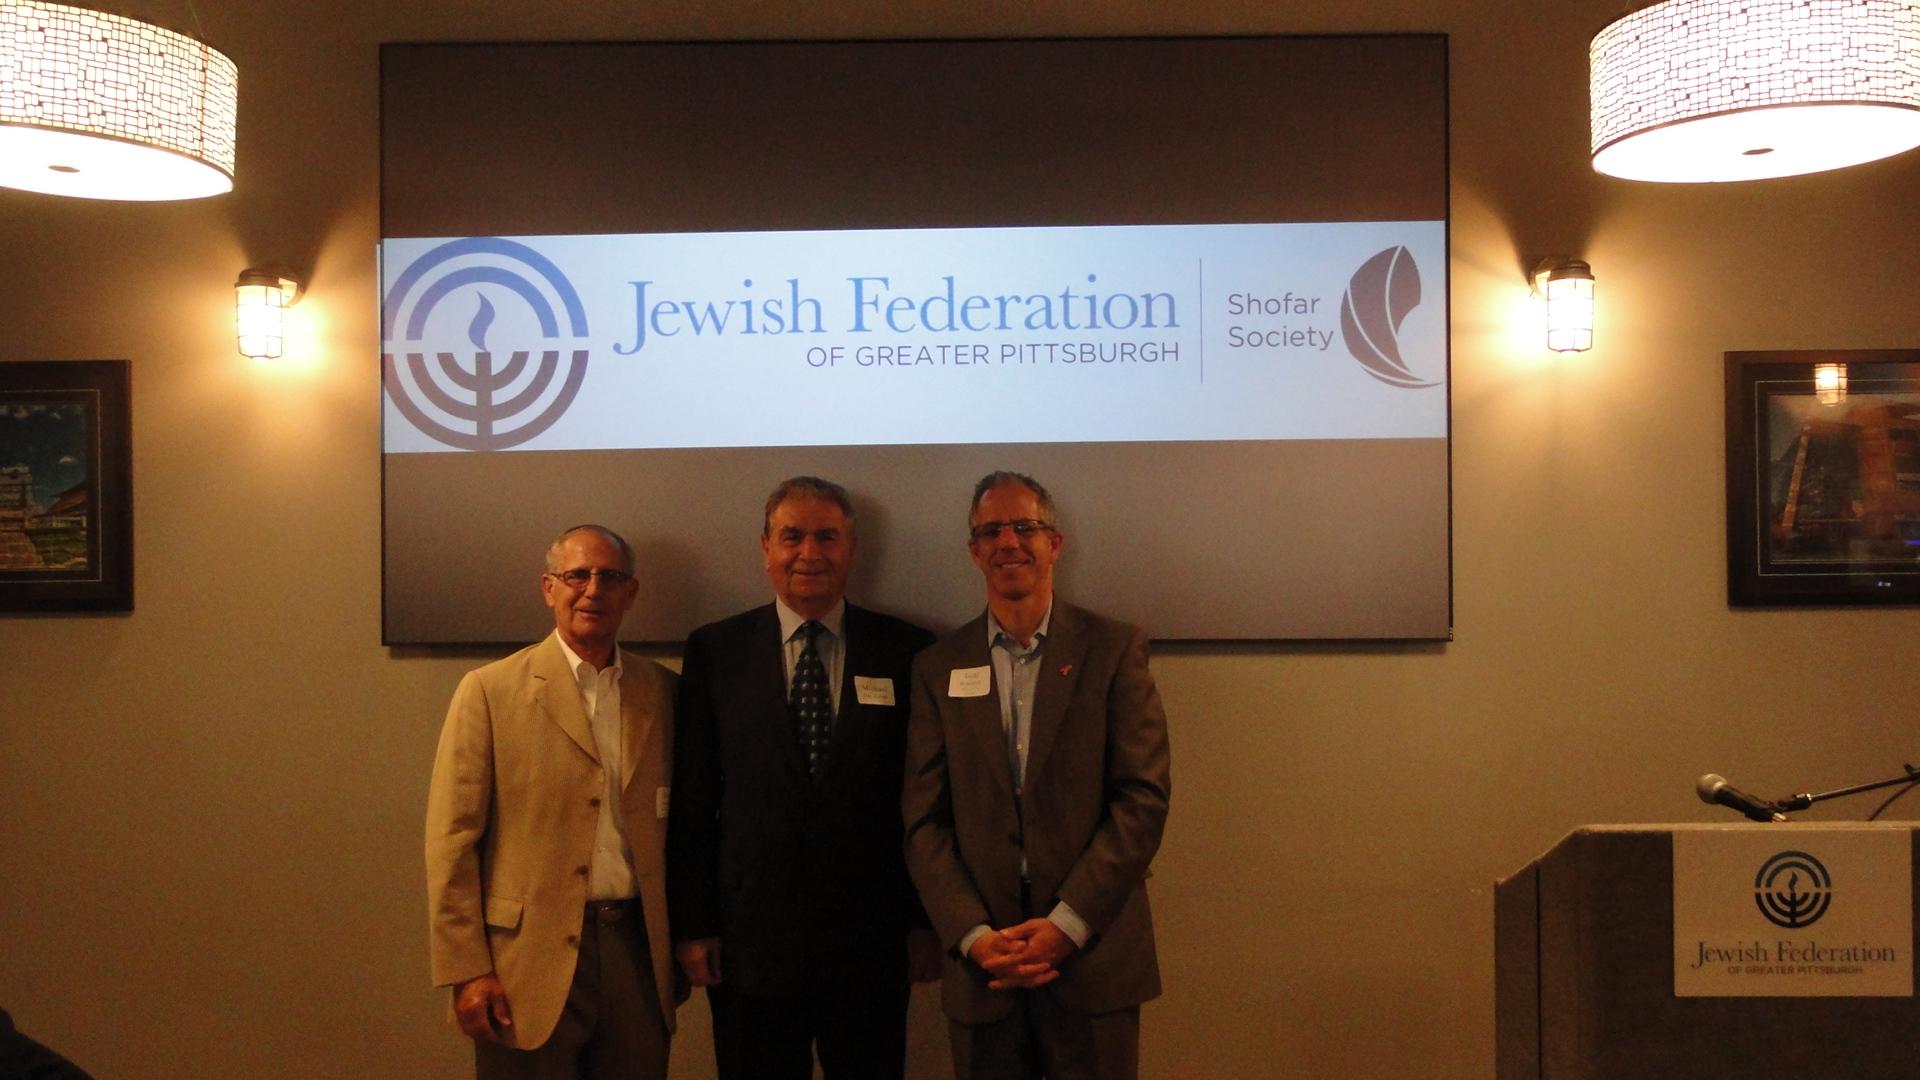 David Steinbach, Shofar Society Chair, with guest speaker Michael Bar-Zohar and Todd Rosenfeld, Shofar Society Co-Chair.